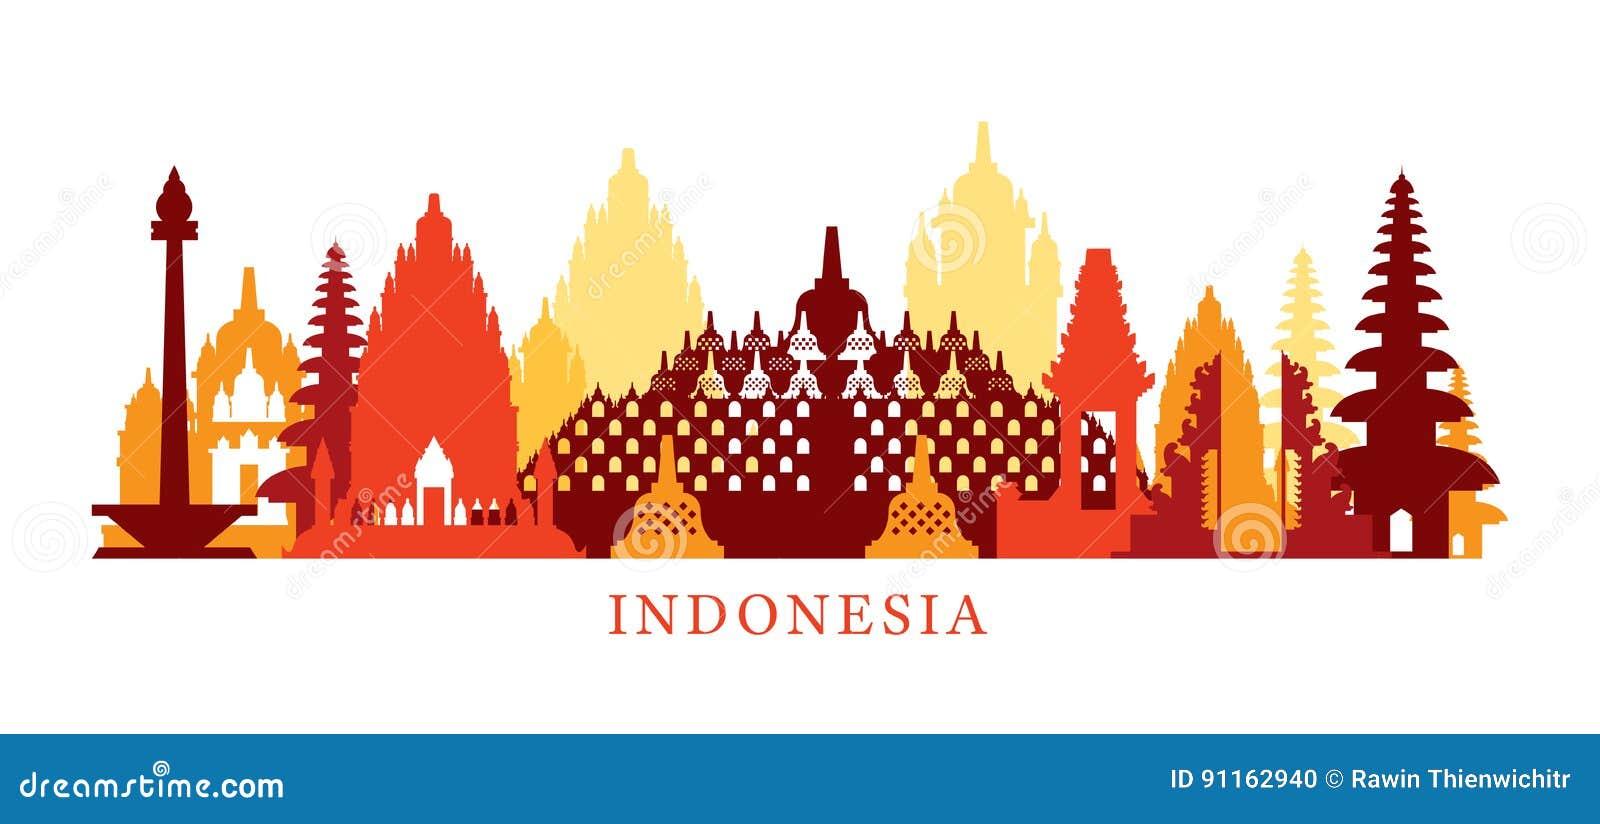 Bali Vacation   Trip Ideas   Travel   Leisure  Bali Tourist Destinations: 64 CITY X  BALI